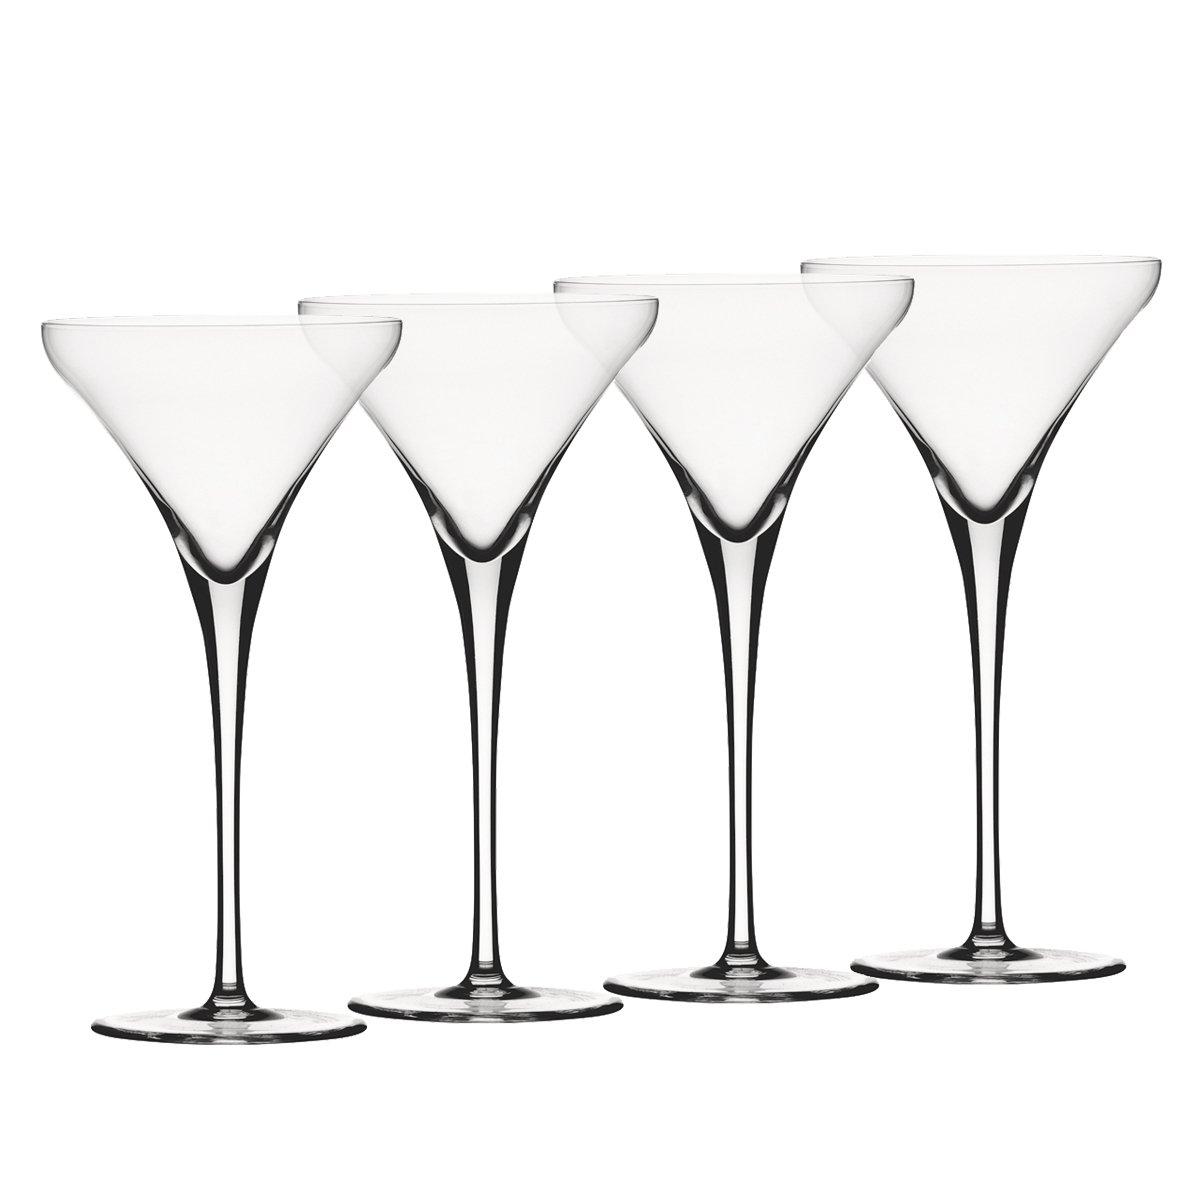 Spiegelau Willsberger Anniversary Martini Glass, Set of 4